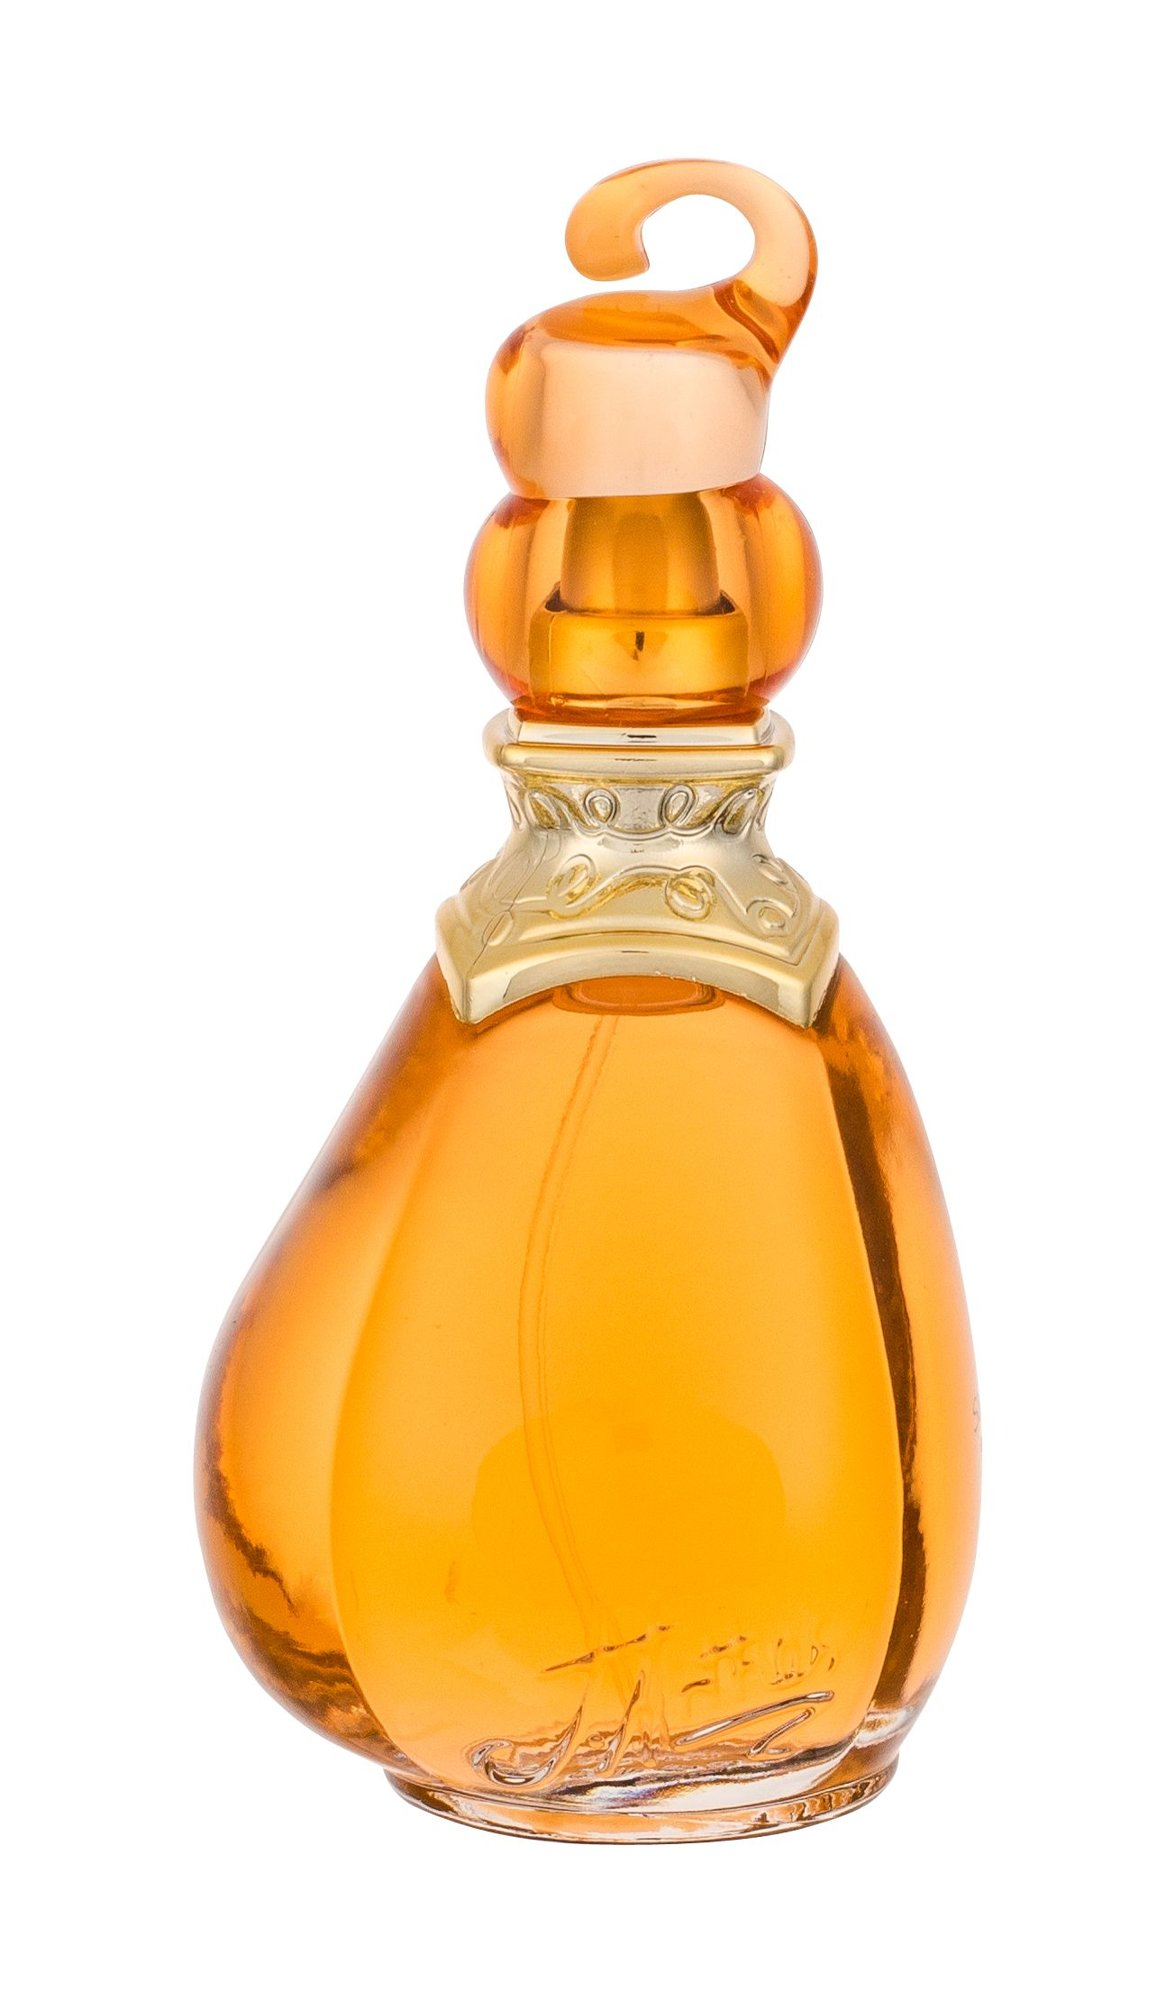 Jeanne Arthes Sultane Eau de Parfum 100ml